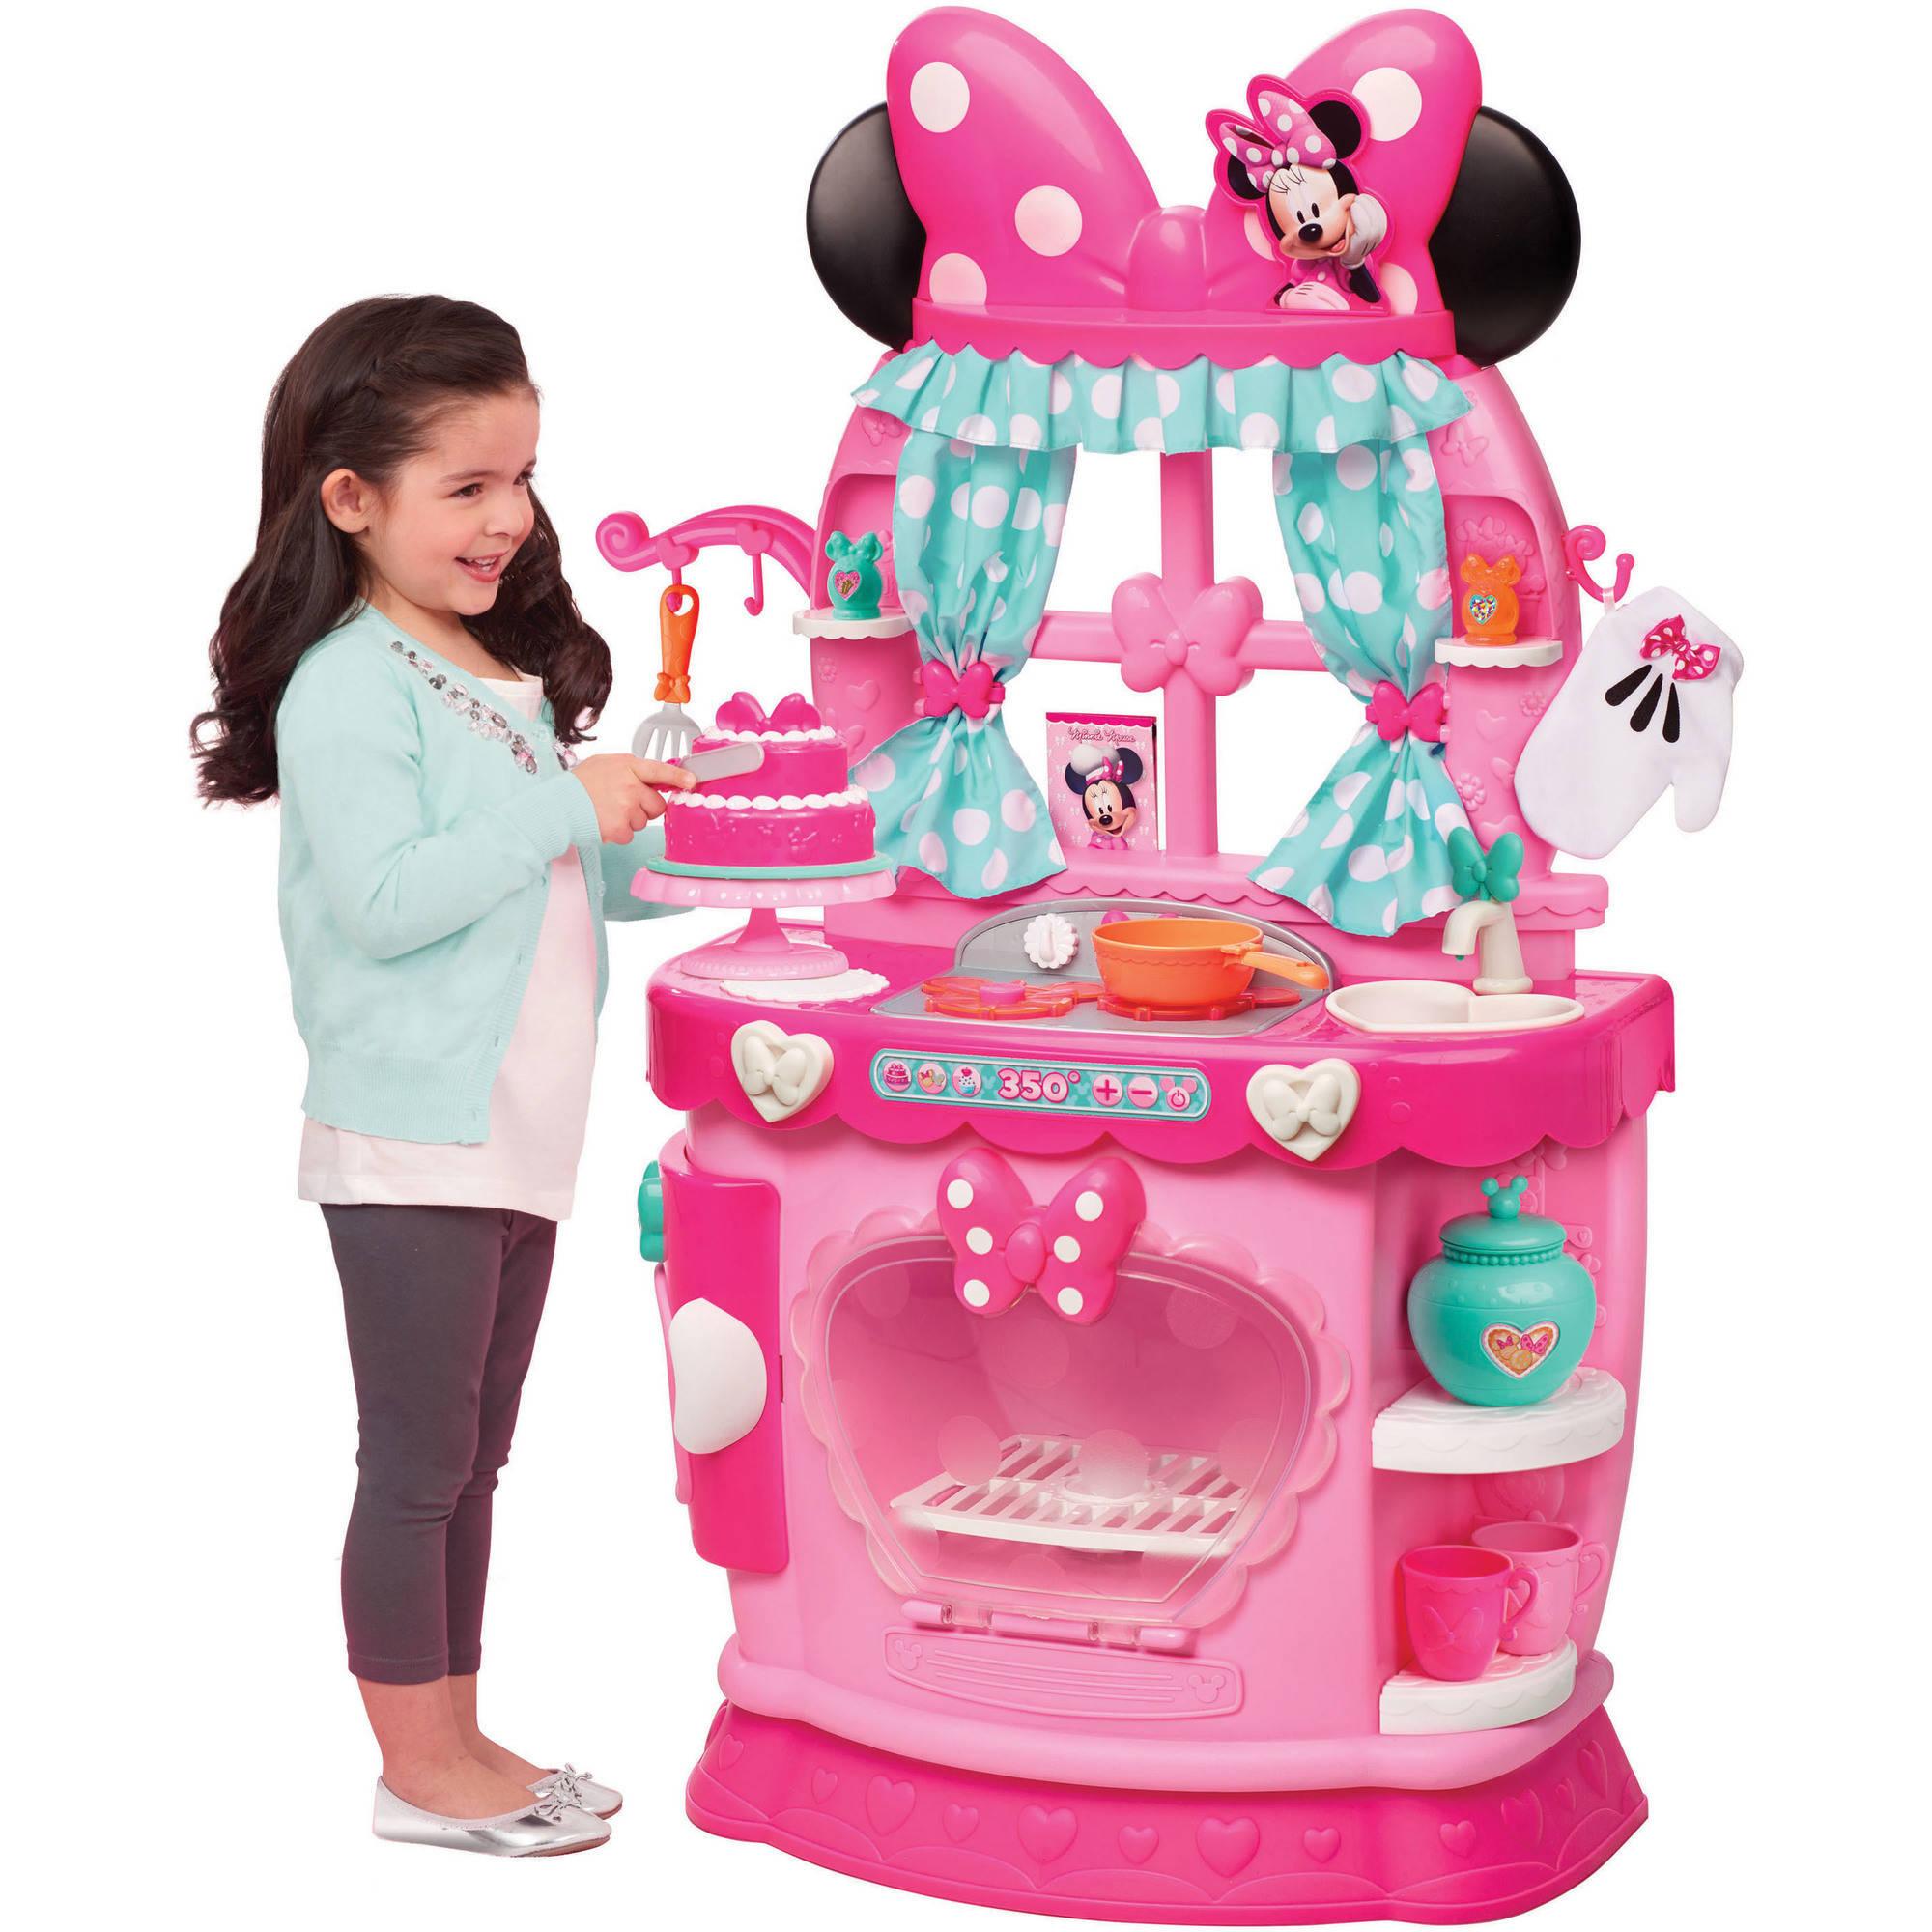 Disney Minnie Bow-Tique Sweet Surprises Kitchen - Walmart.com